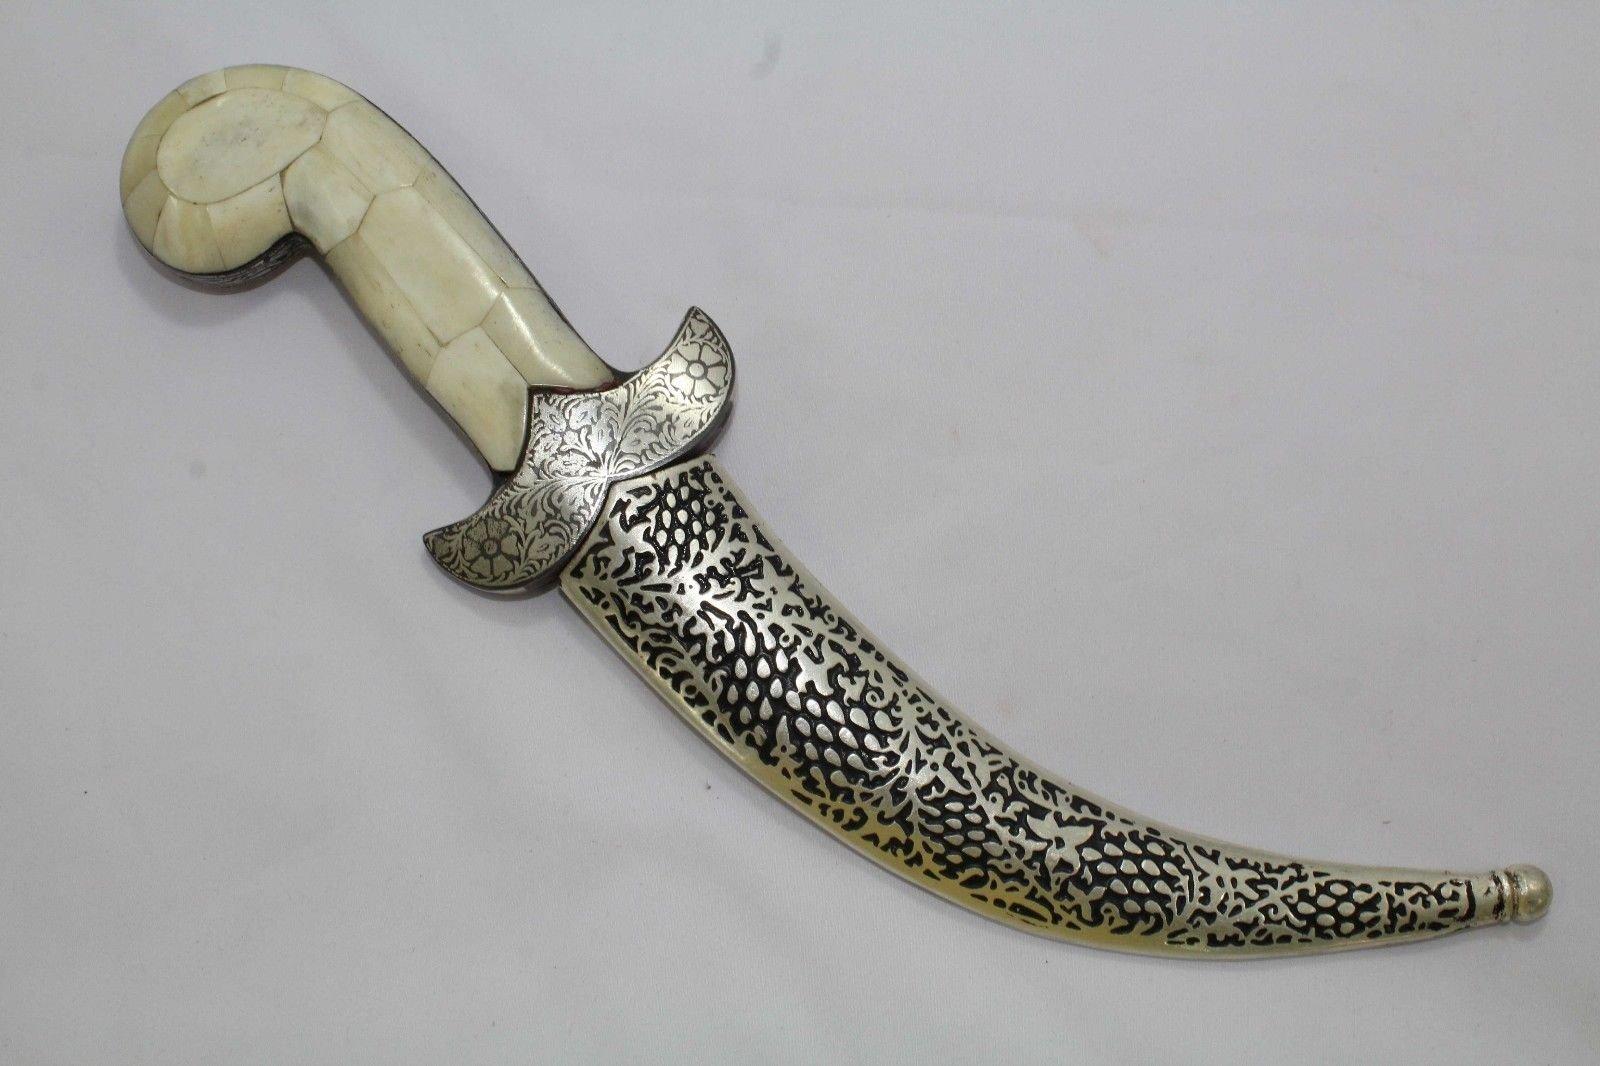 Rajasthan Gems Dagger Knife Damascus Steel Blade Silver Wire Engraved Work Camel bone Handle